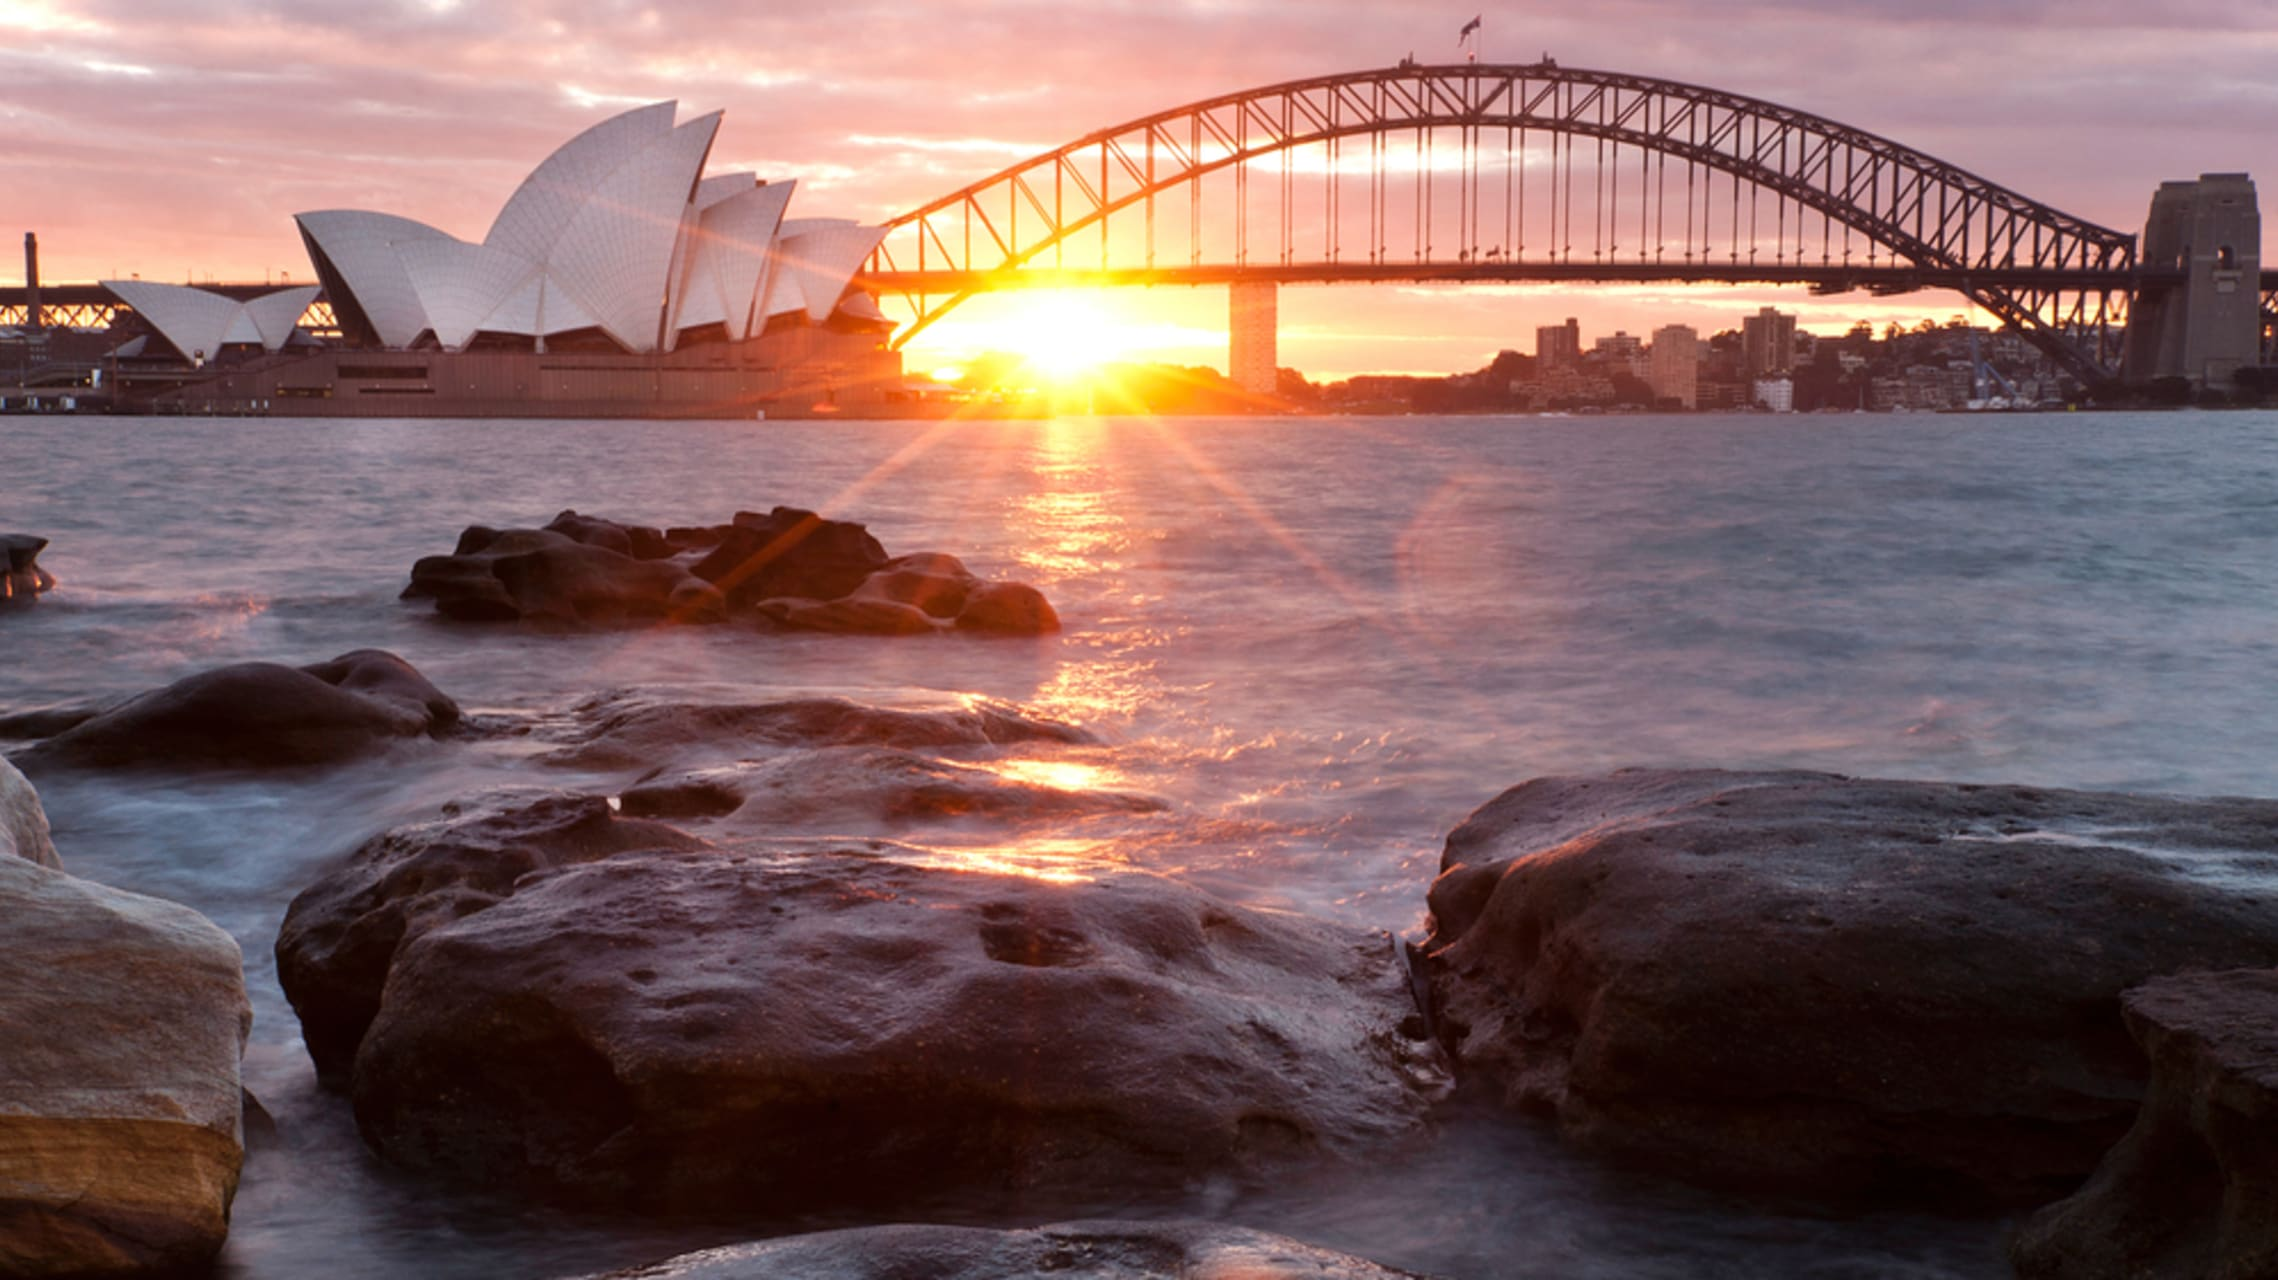 Sydney - Winter Solstice Special: Sunset Over Sydney Harbour